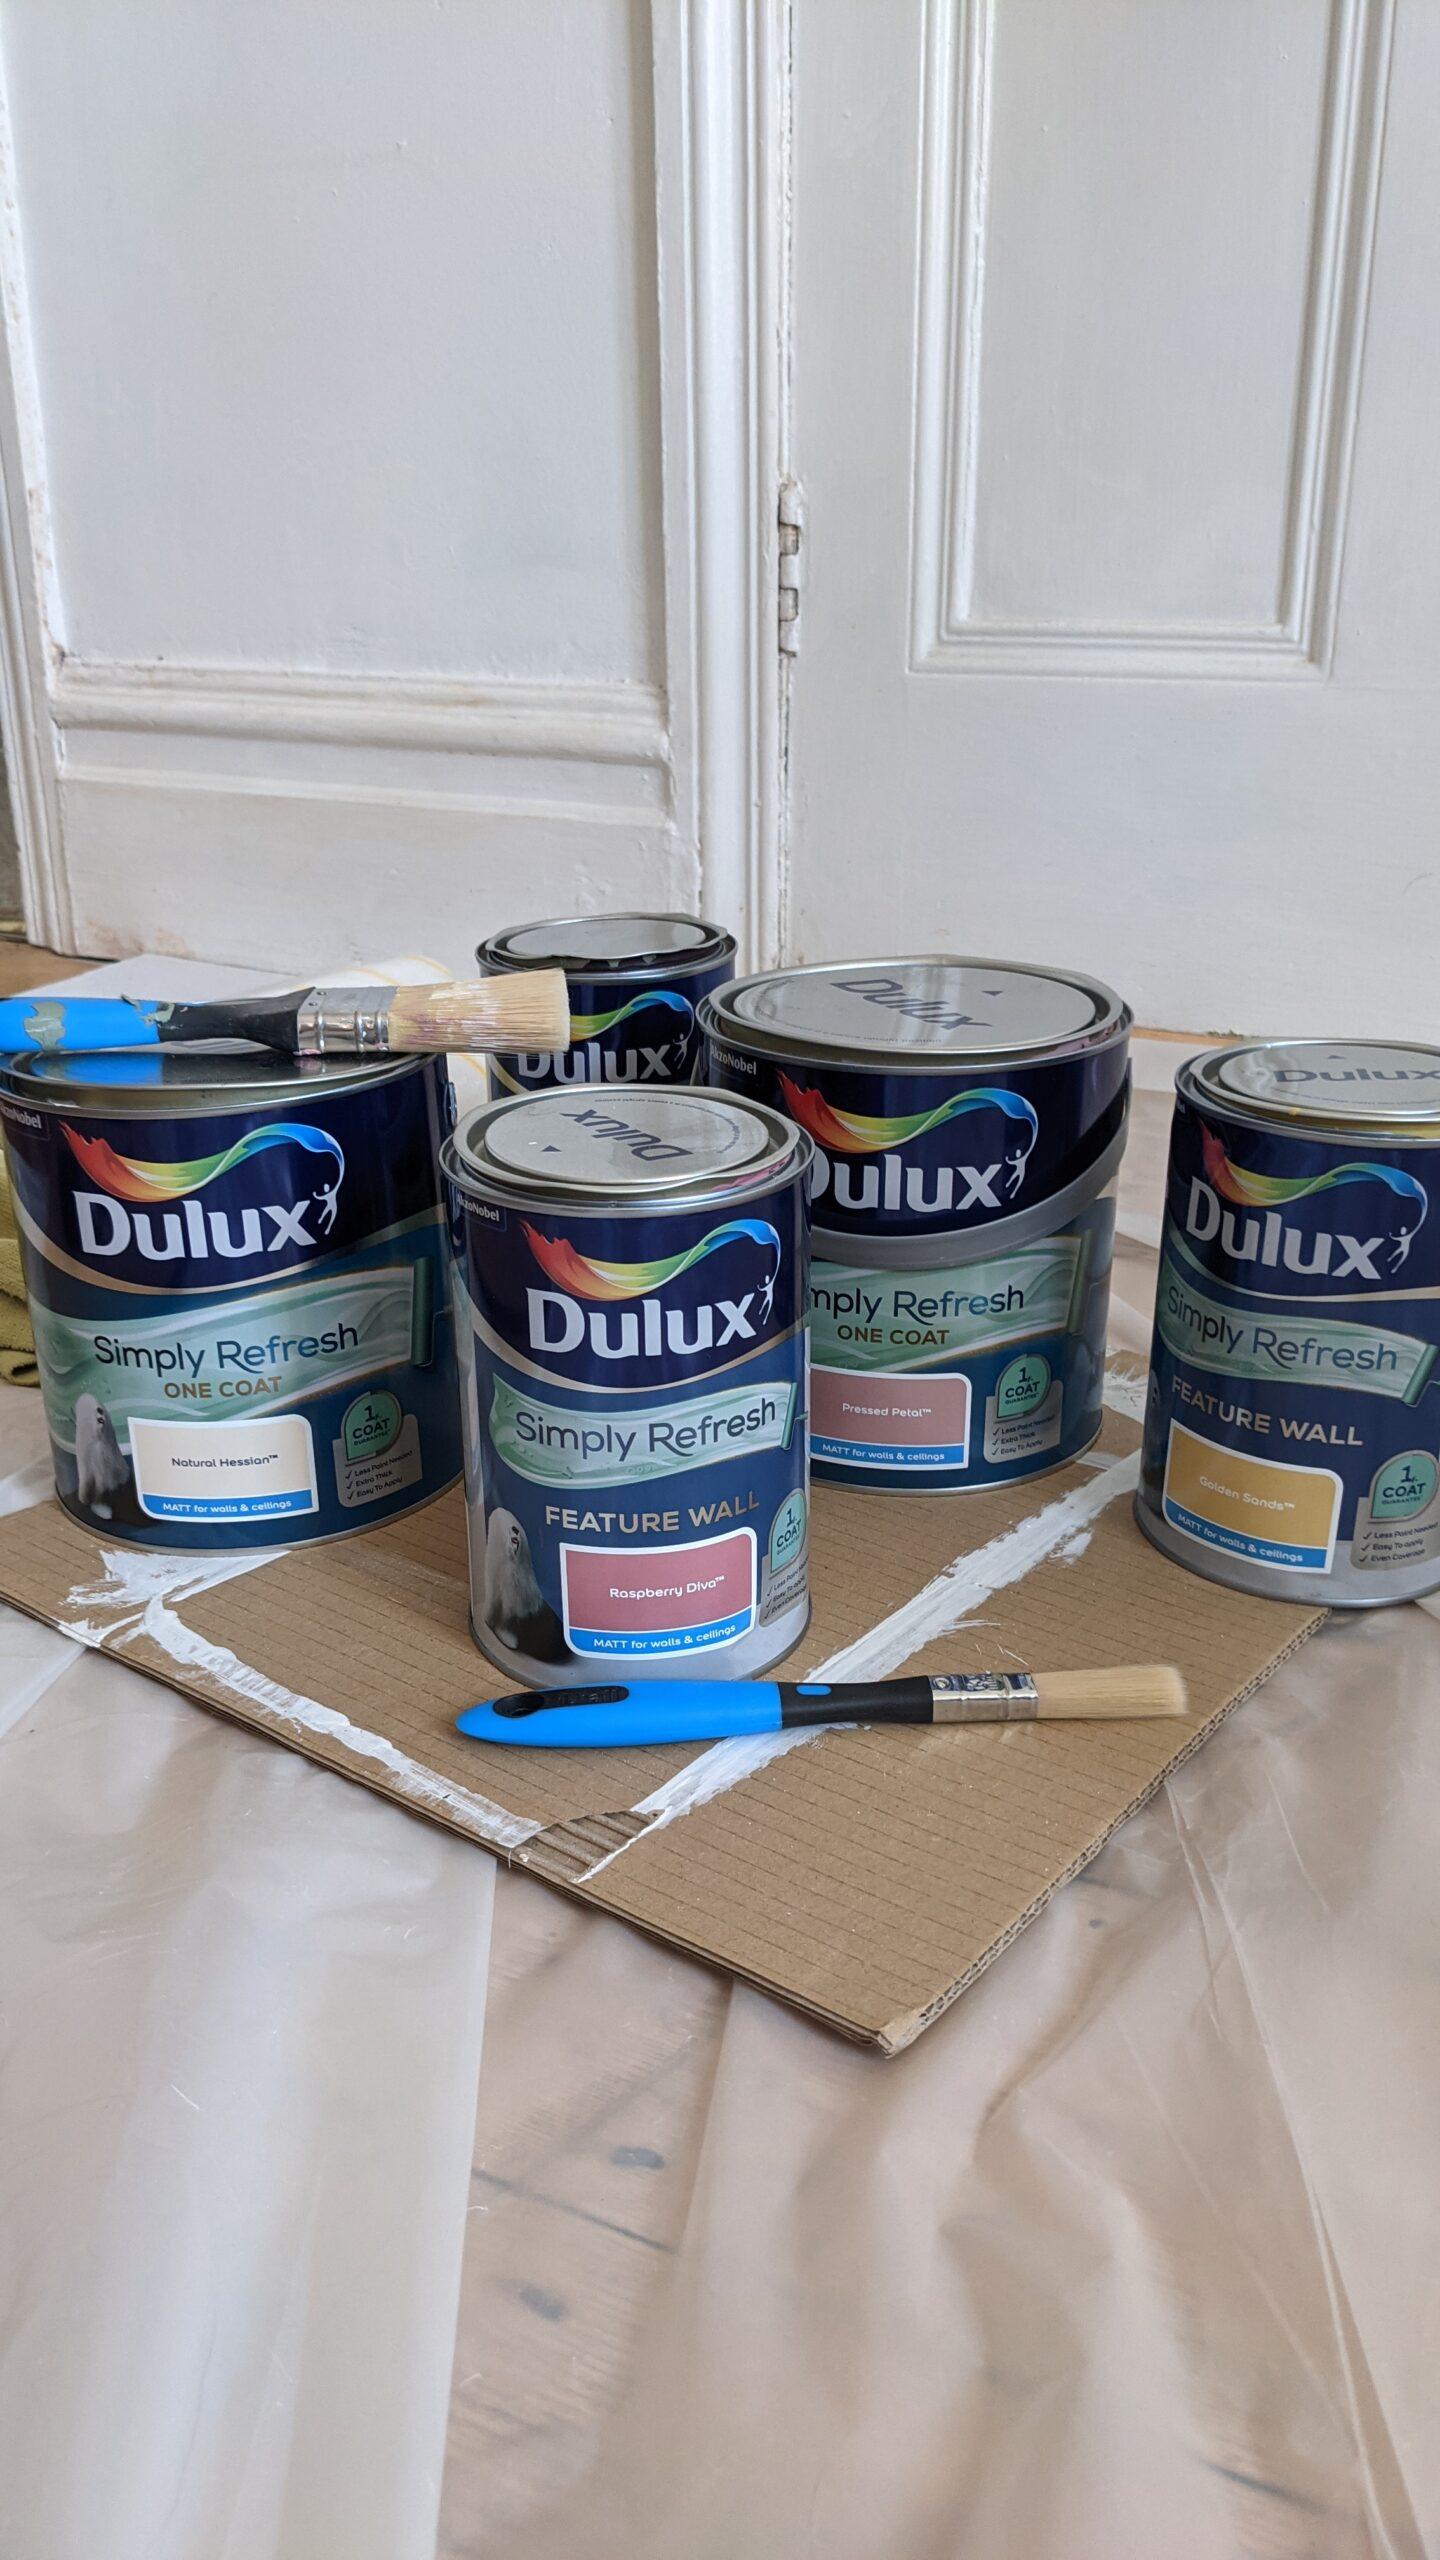 Dulux Simply Refresh Range One Coat Paint